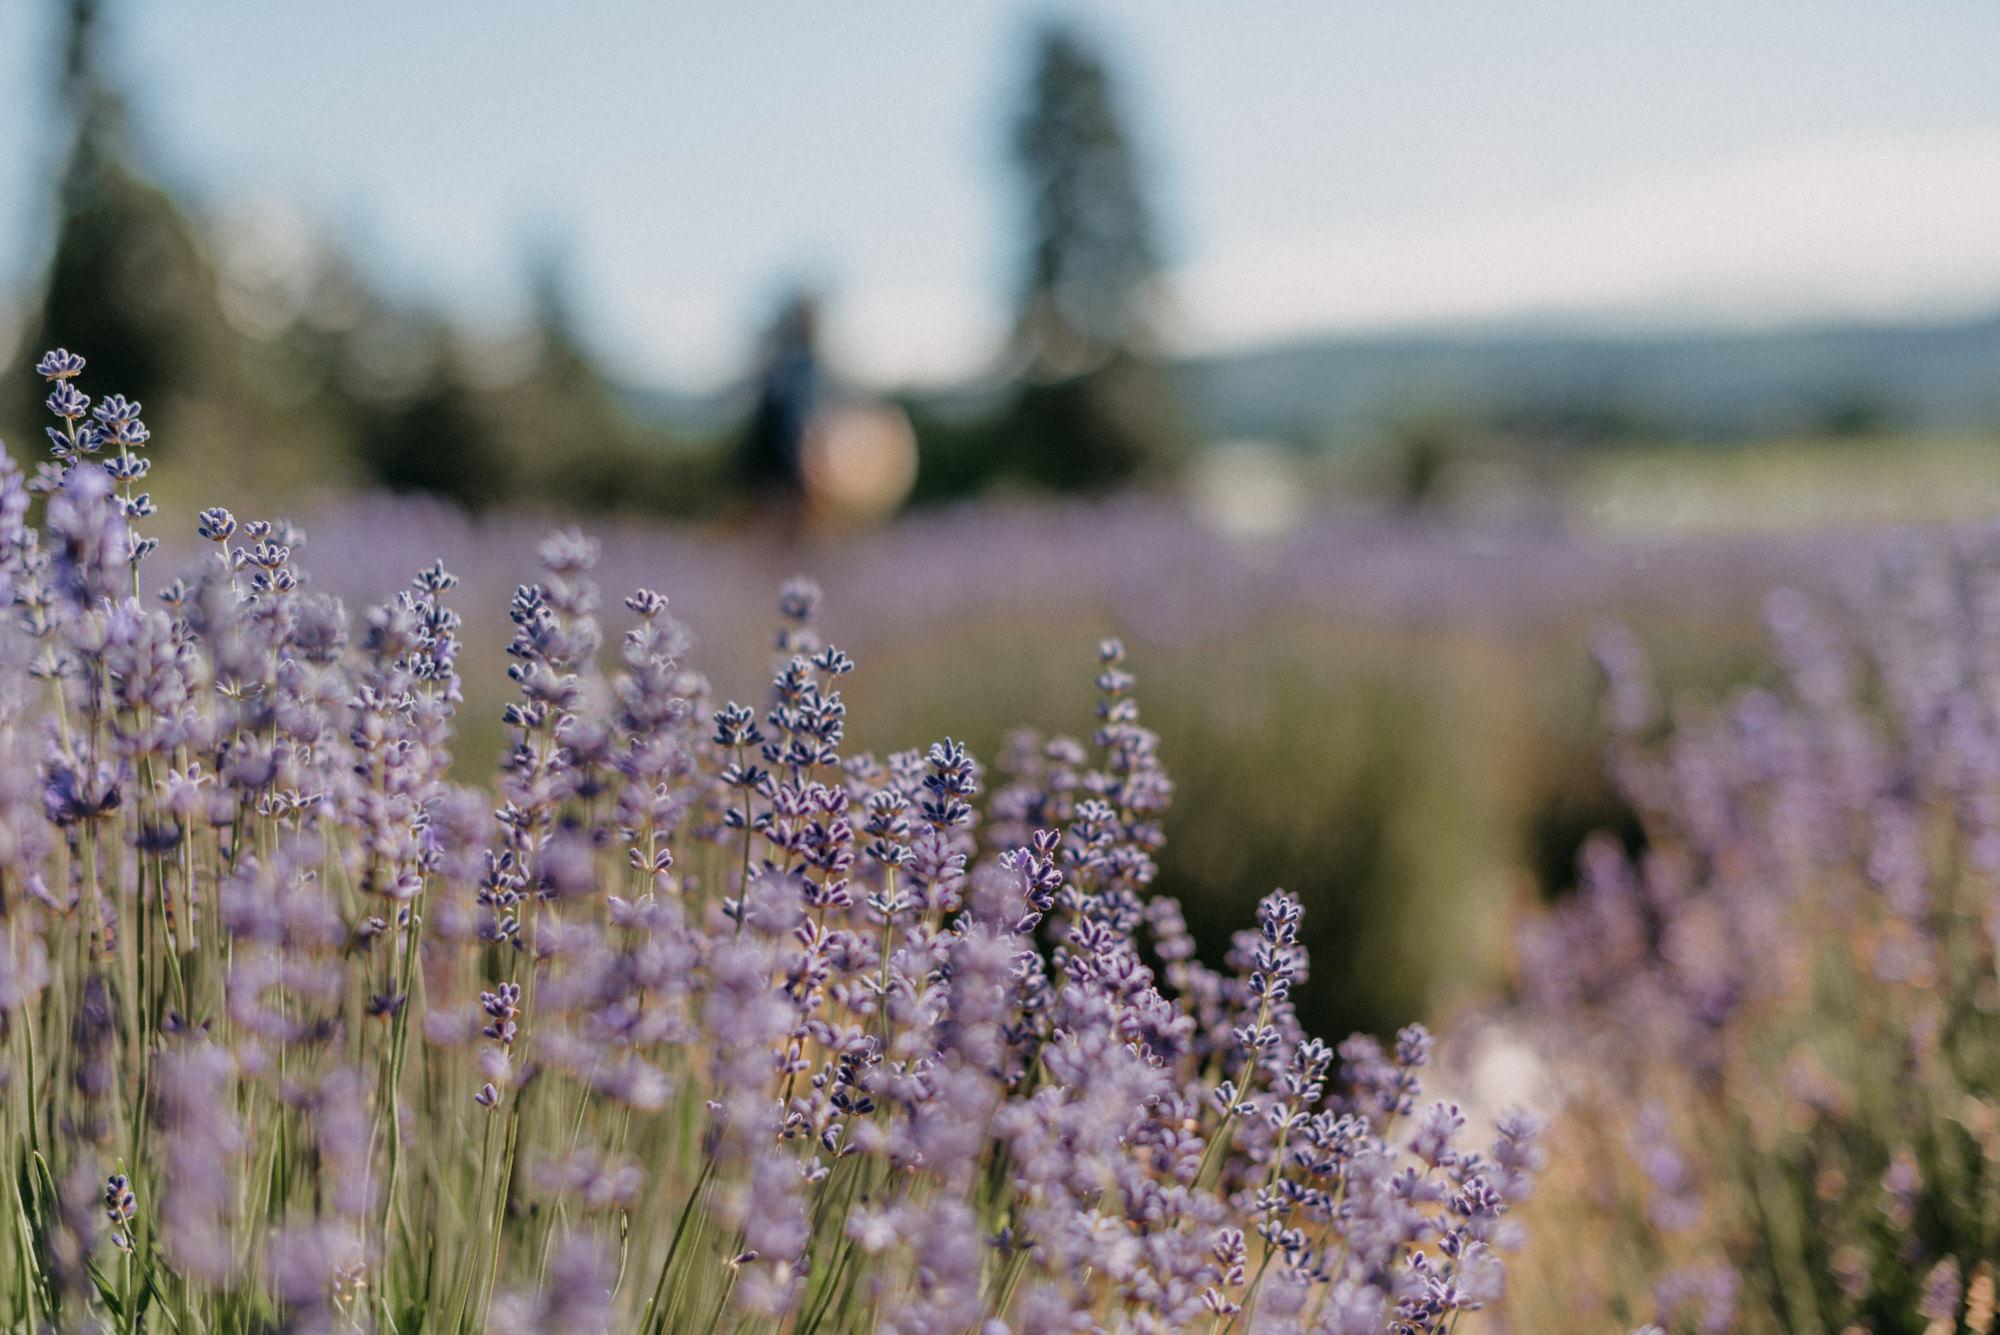 11-Mt-hood-lavender-farms-engagment-couple-summer-7197.jpg